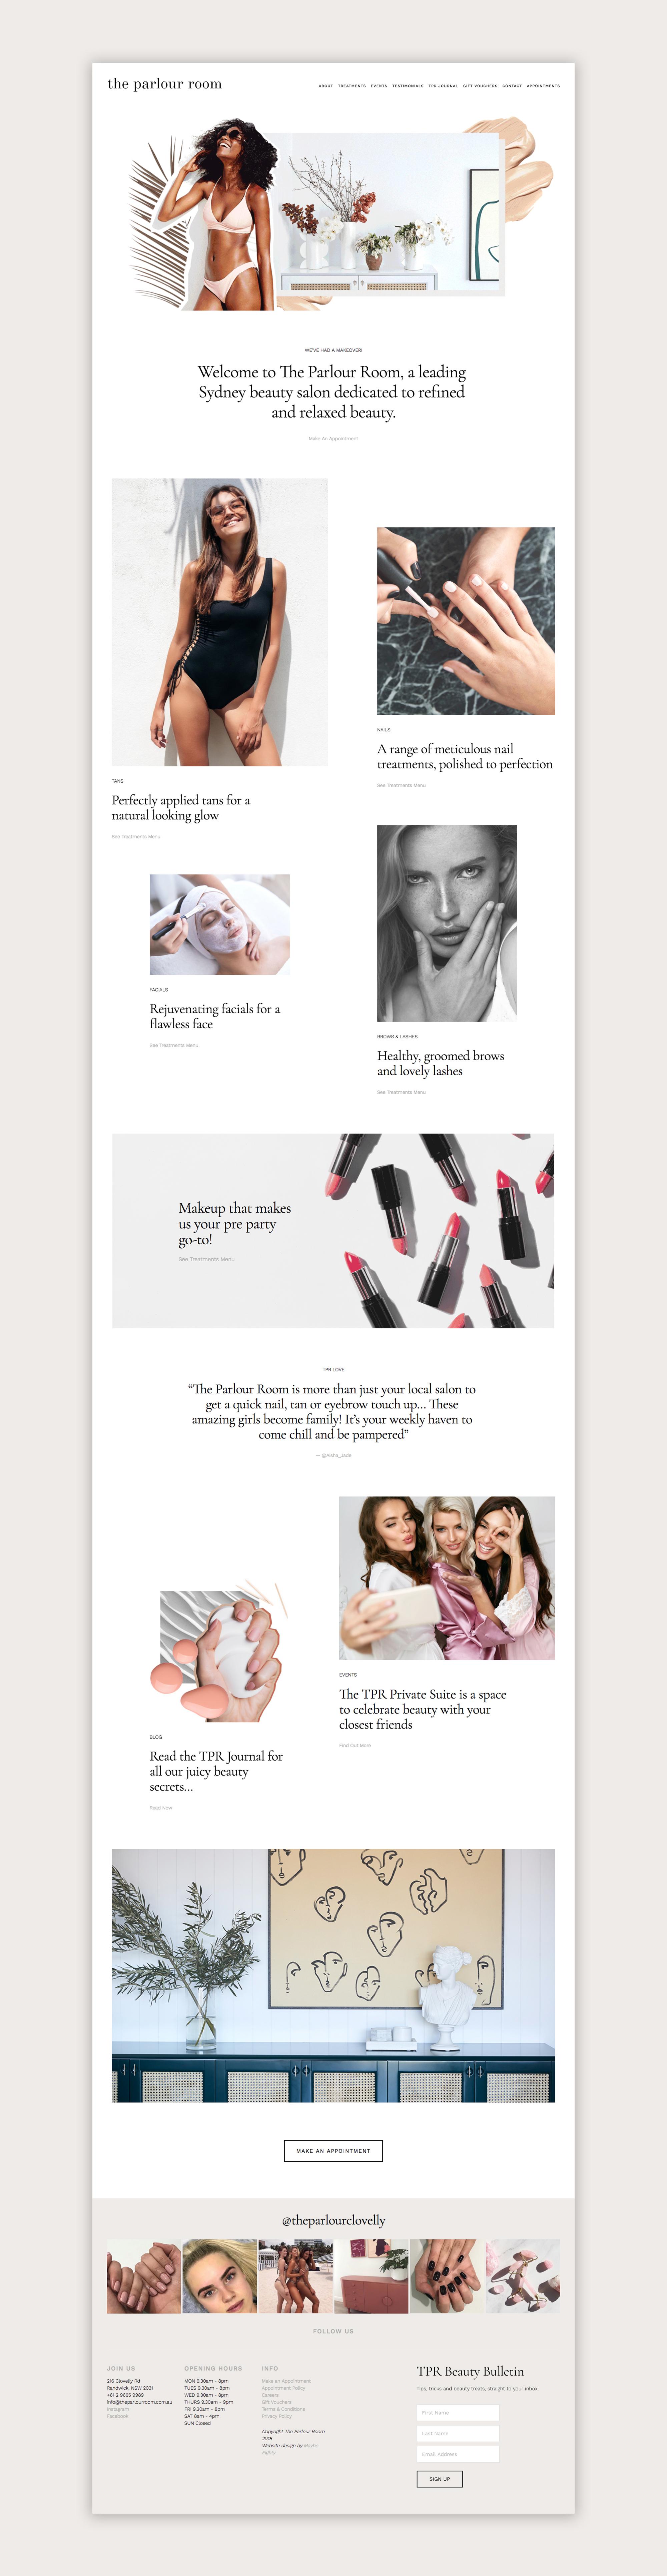 WebDesign-TPR-1a.jpg